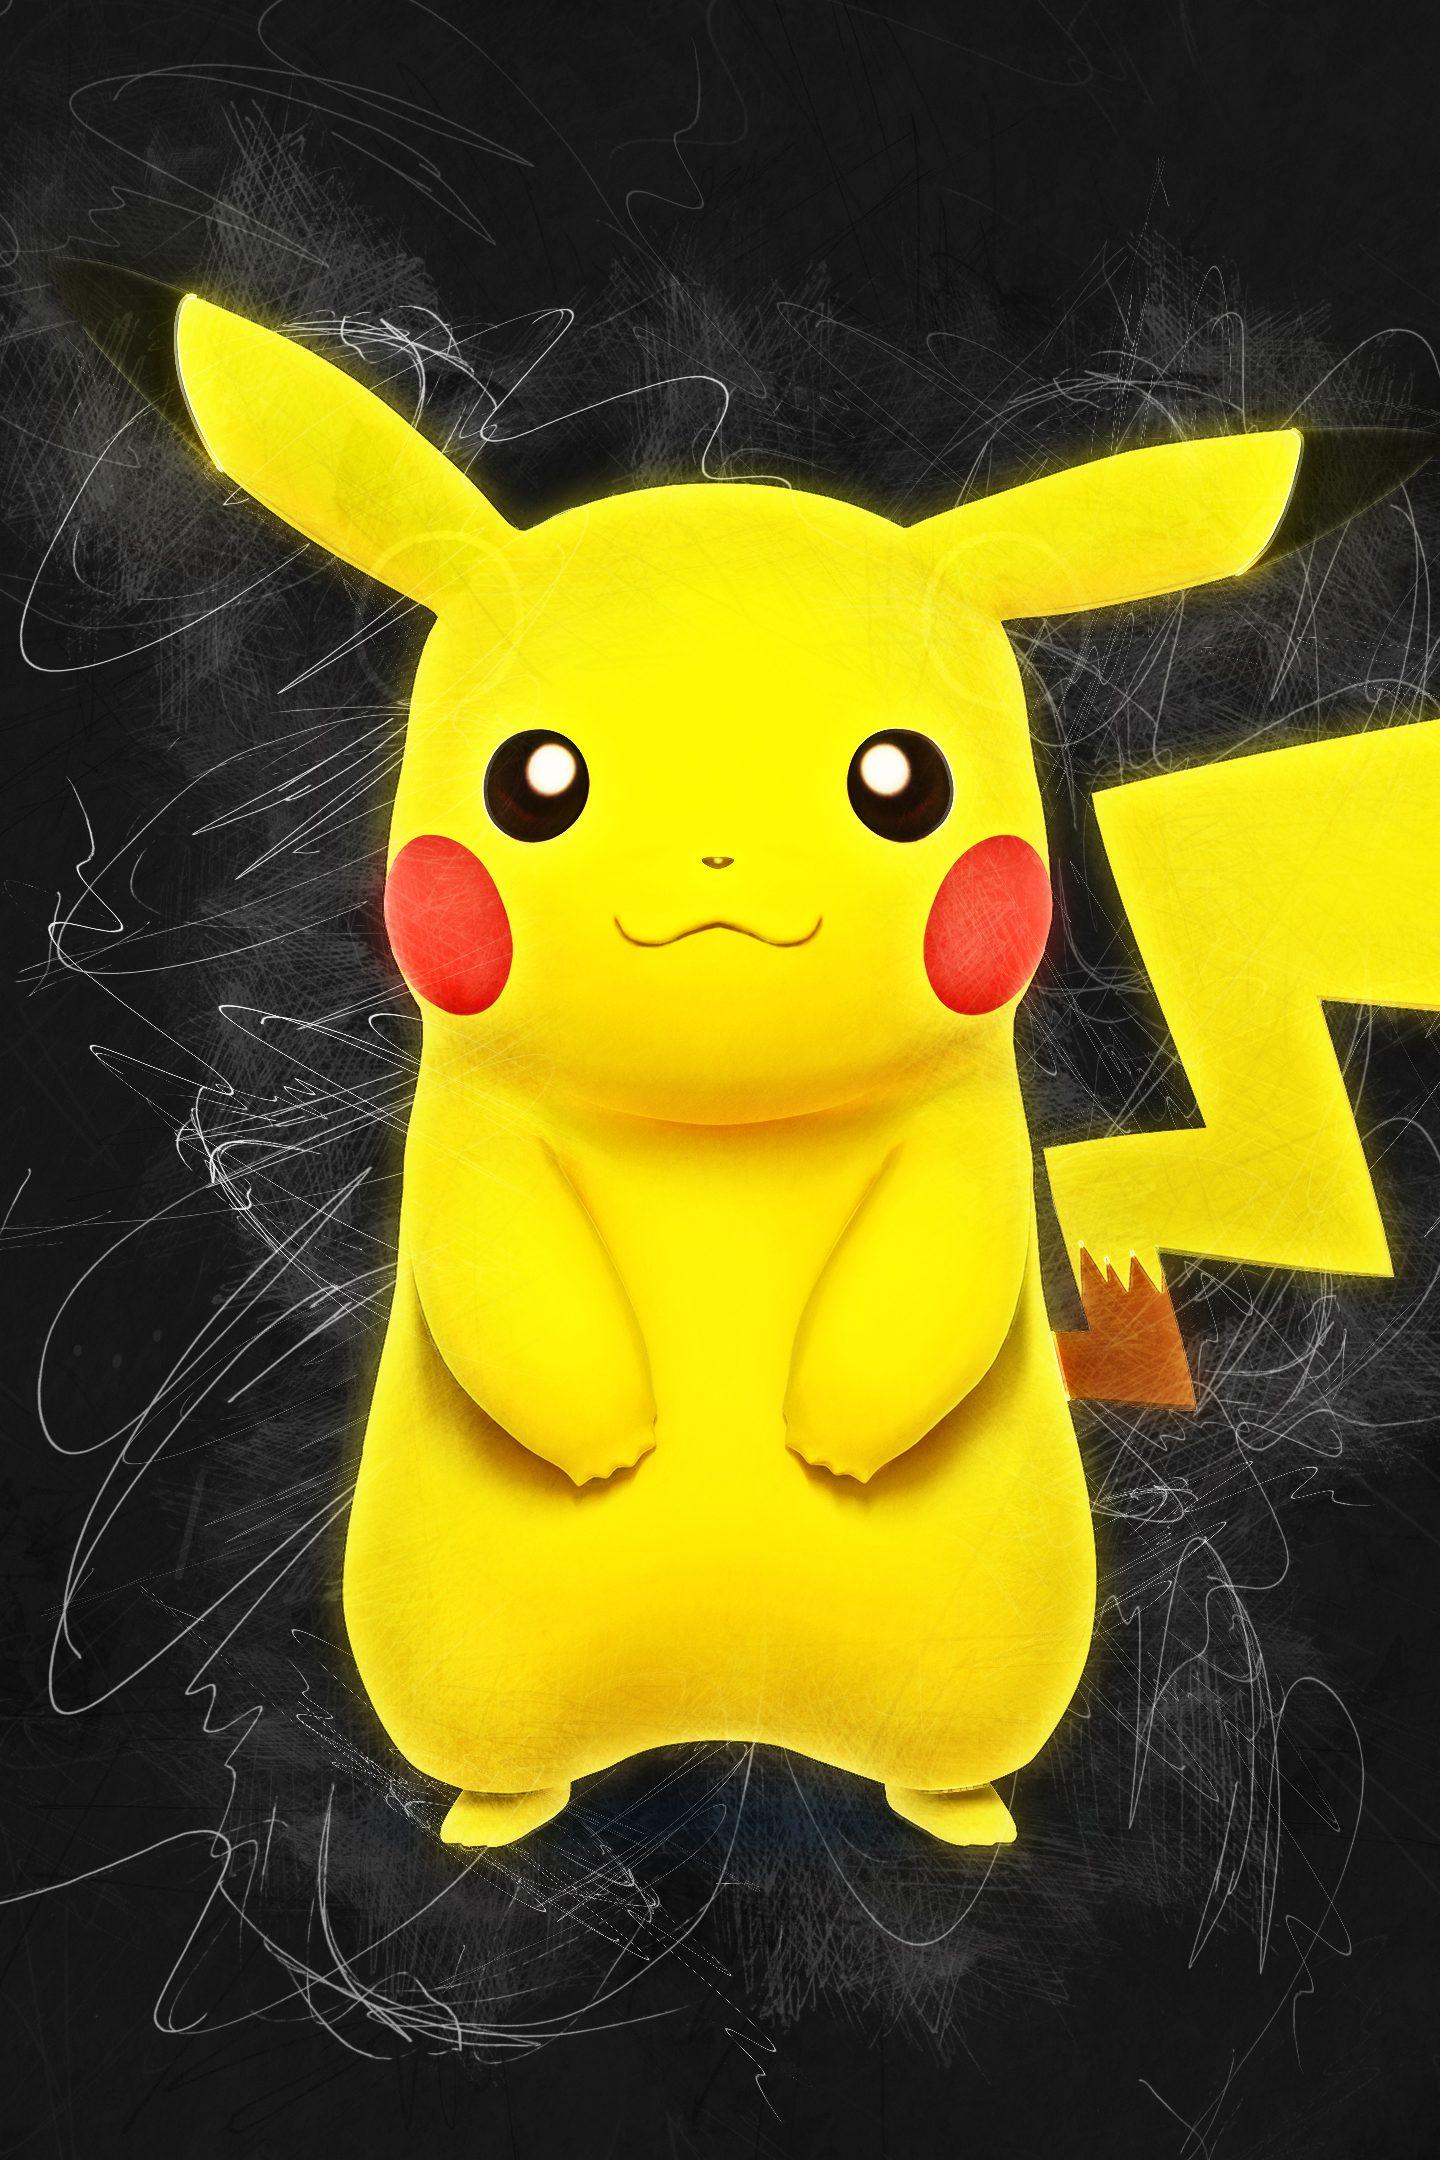 Pokemon Pikachu Artwork 4k Wallpaper Best Wallpapers